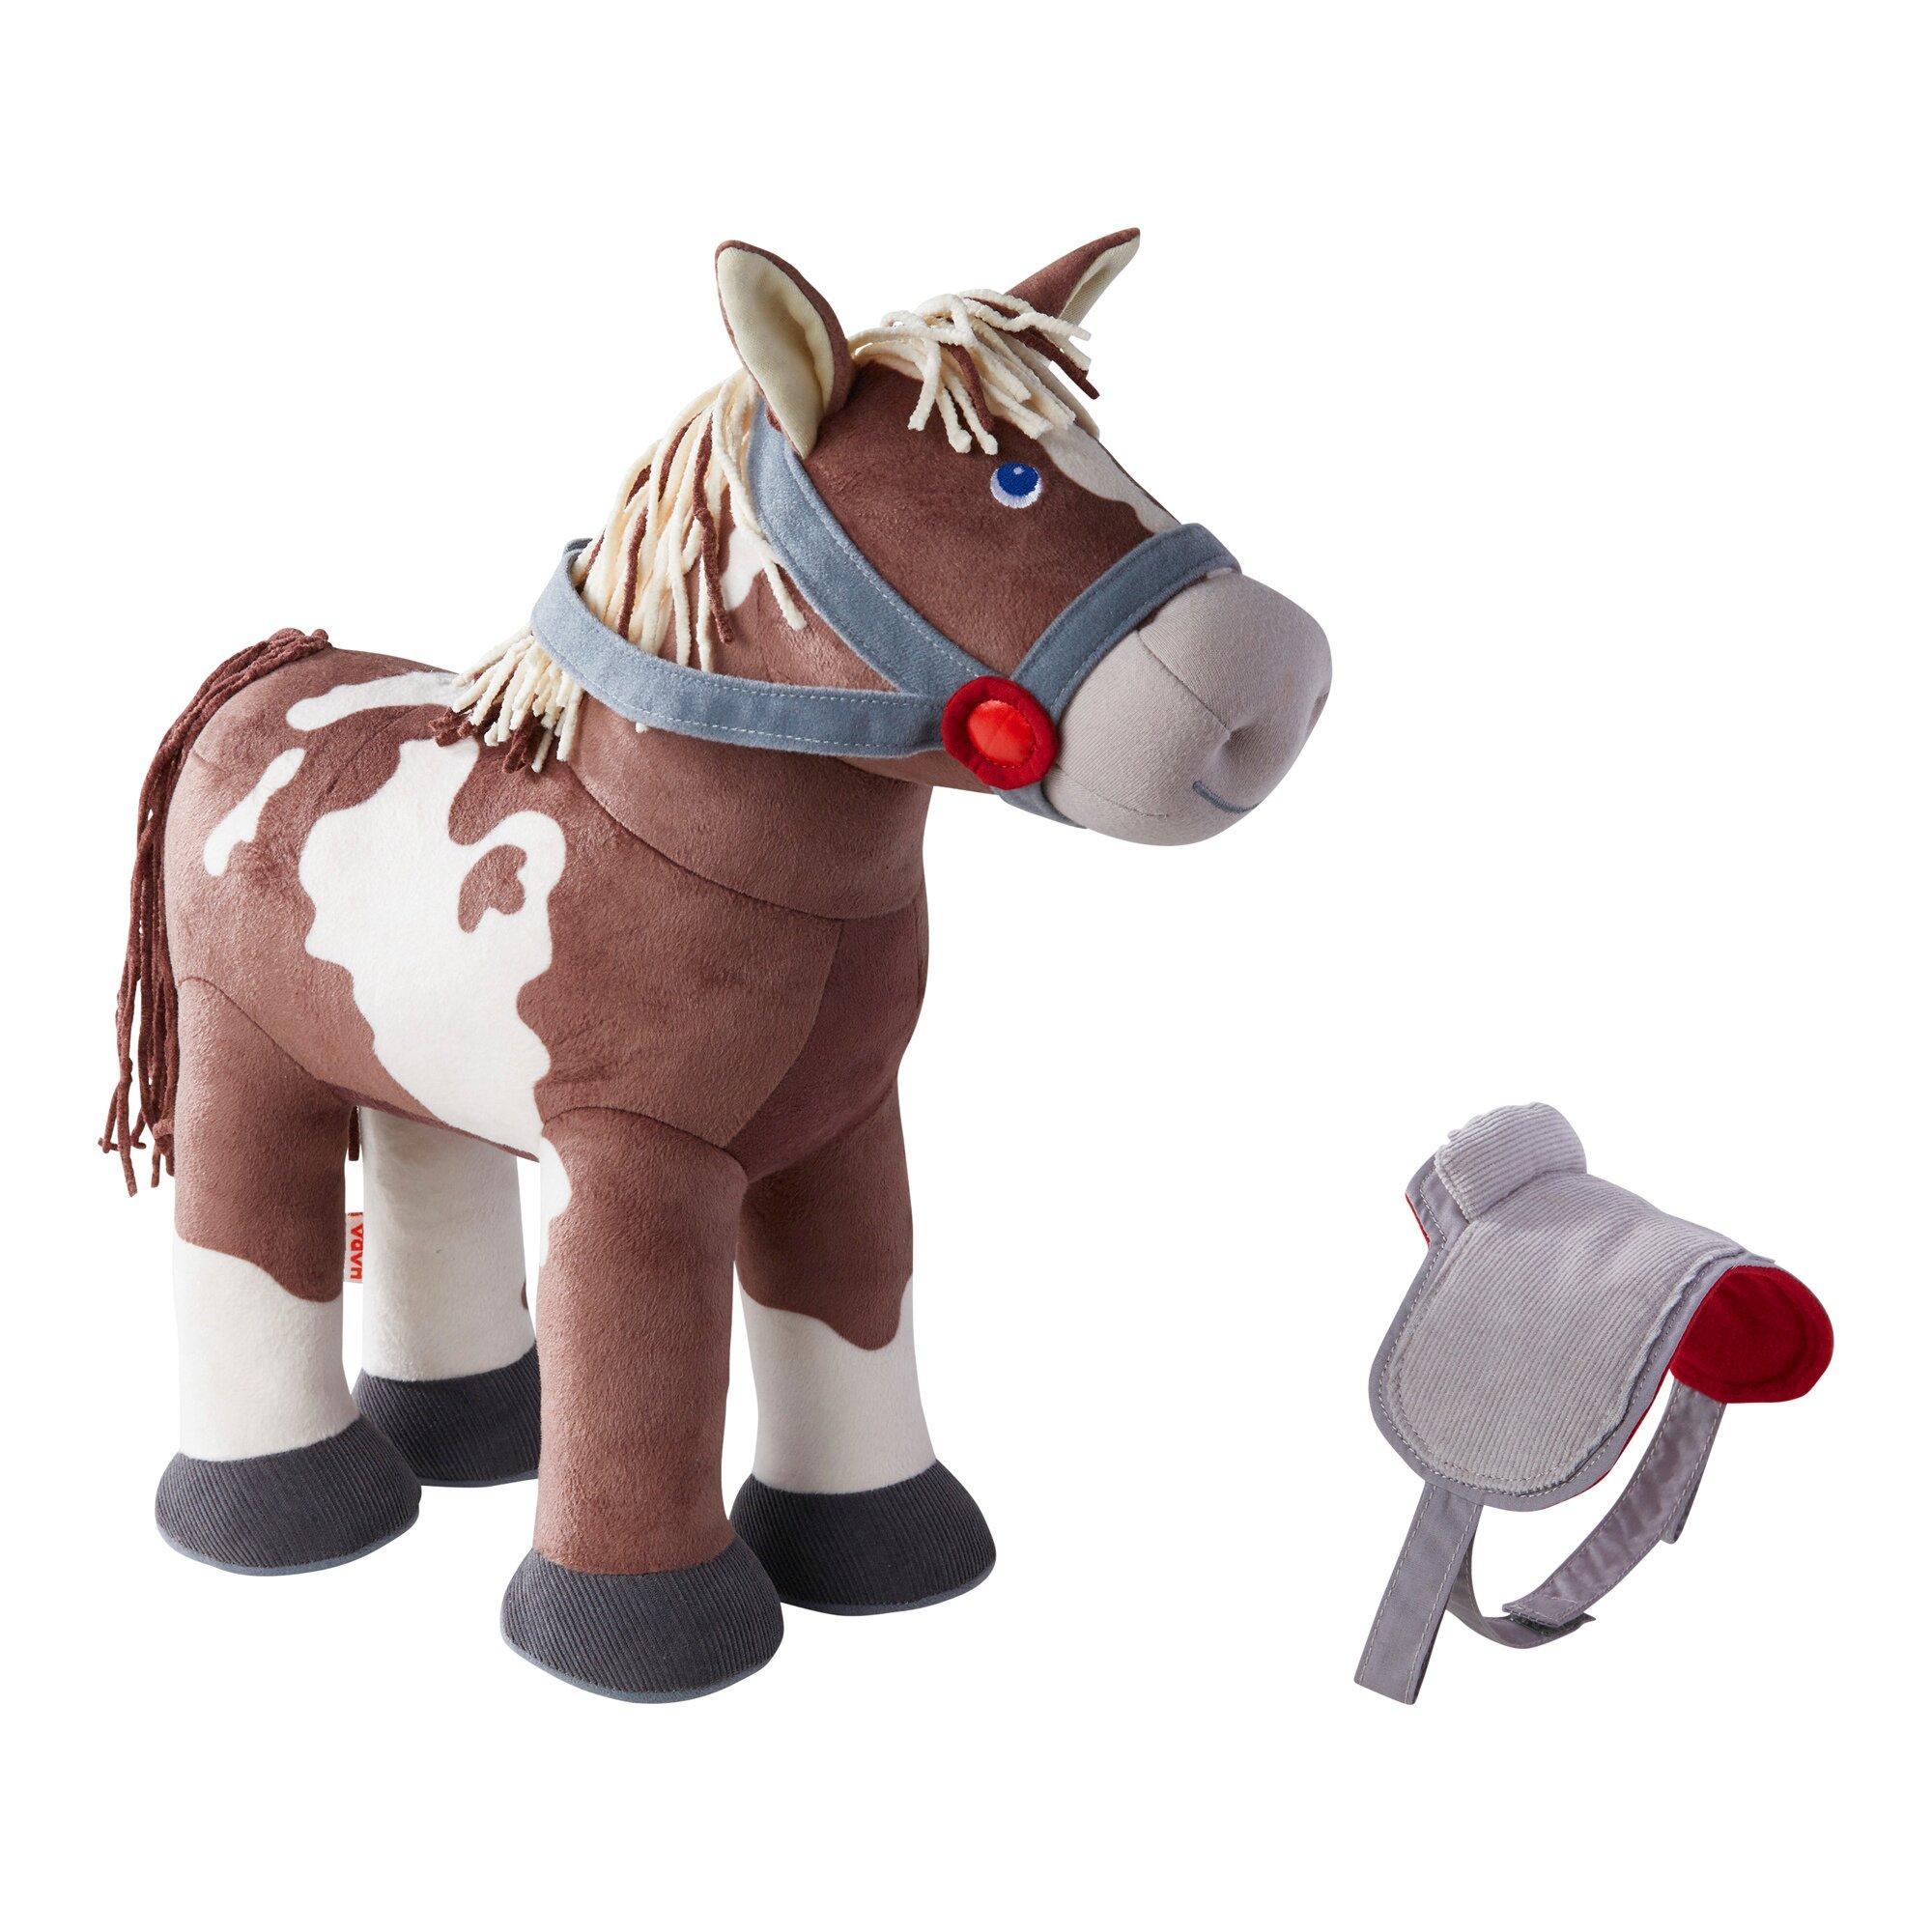 Kuscheltier Pferd Joey 30cm